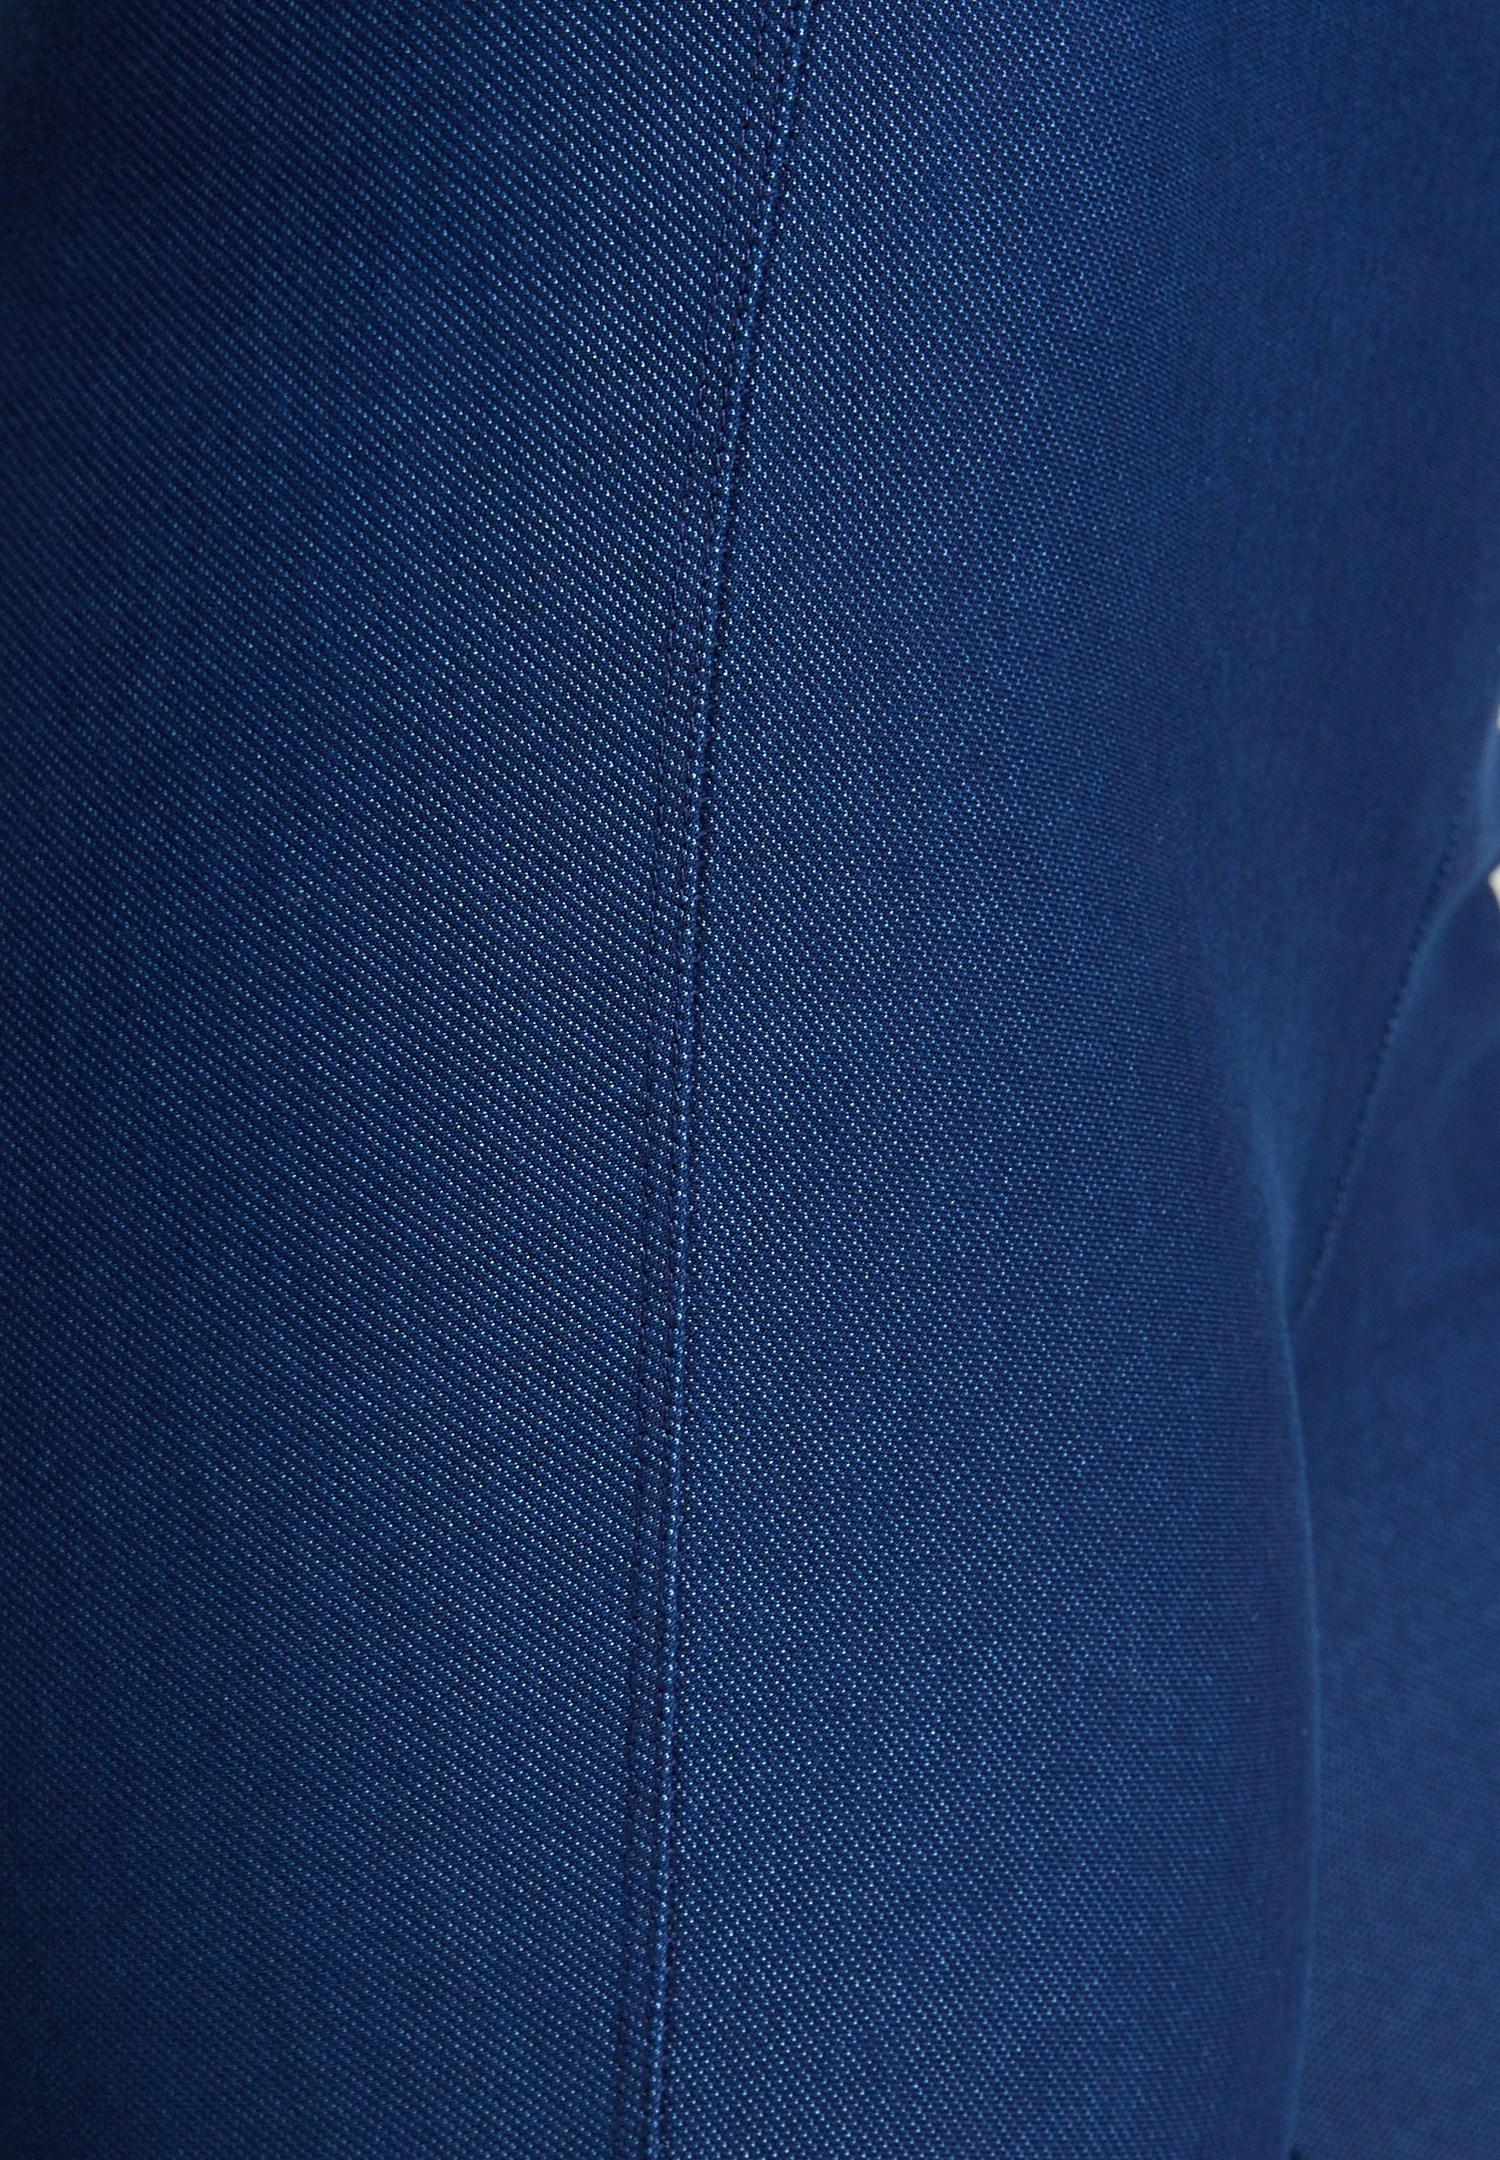 Bayan Mavi Denim Görünümlü Tayt